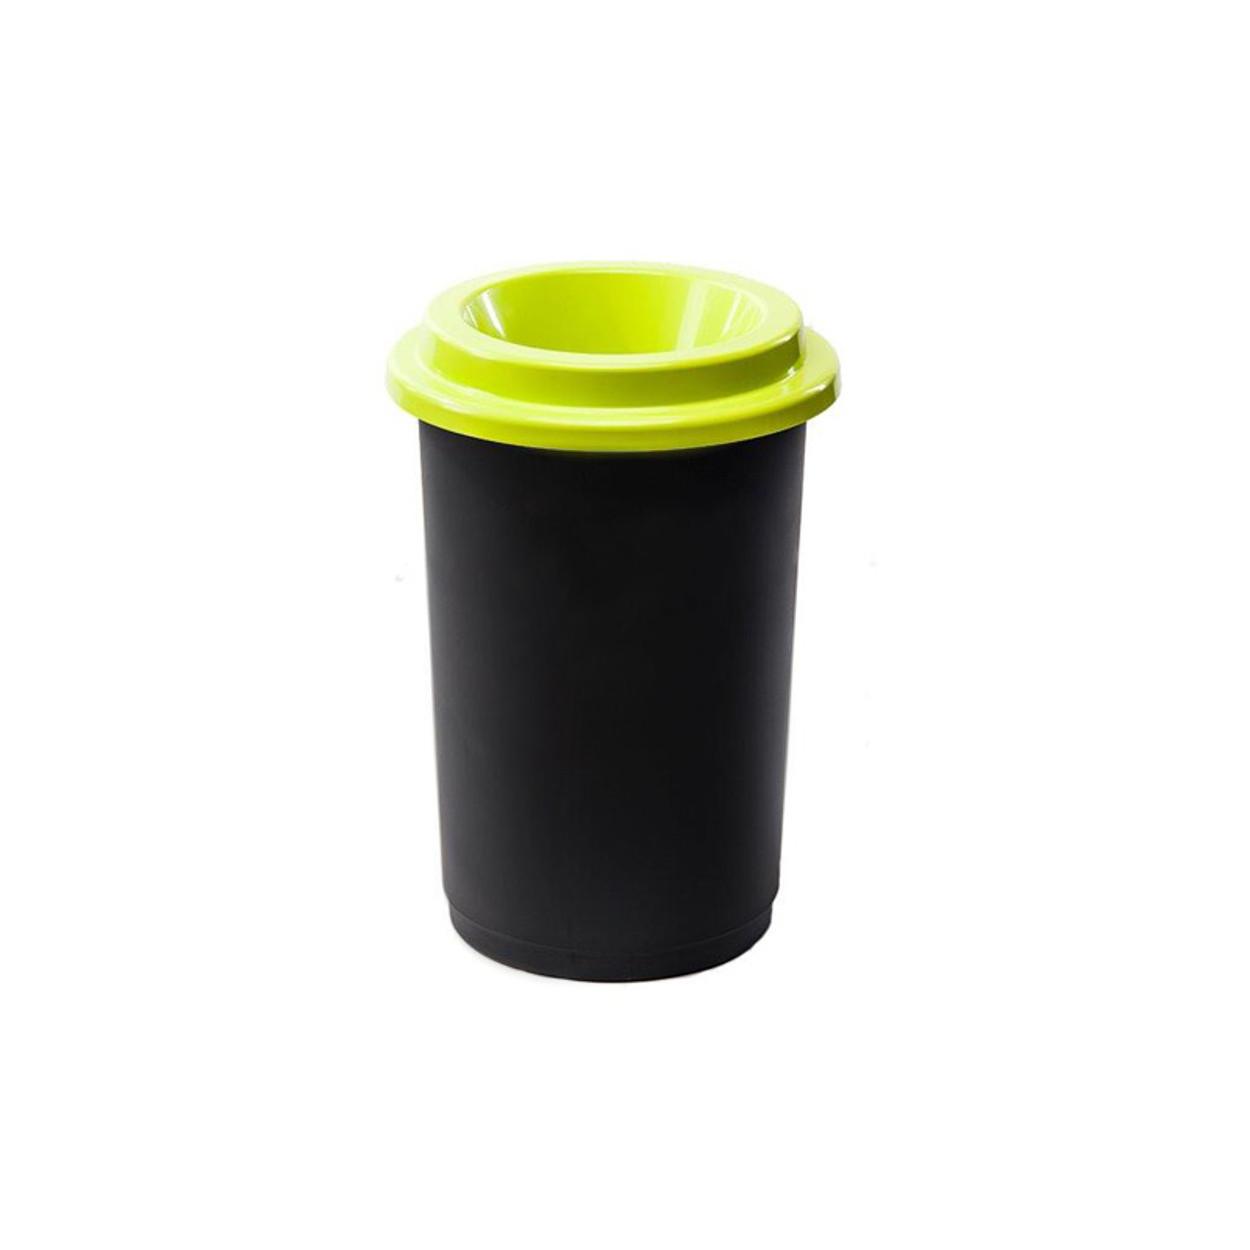 Guľatý plastový kôš na triedený odpad, 50 l, zelená